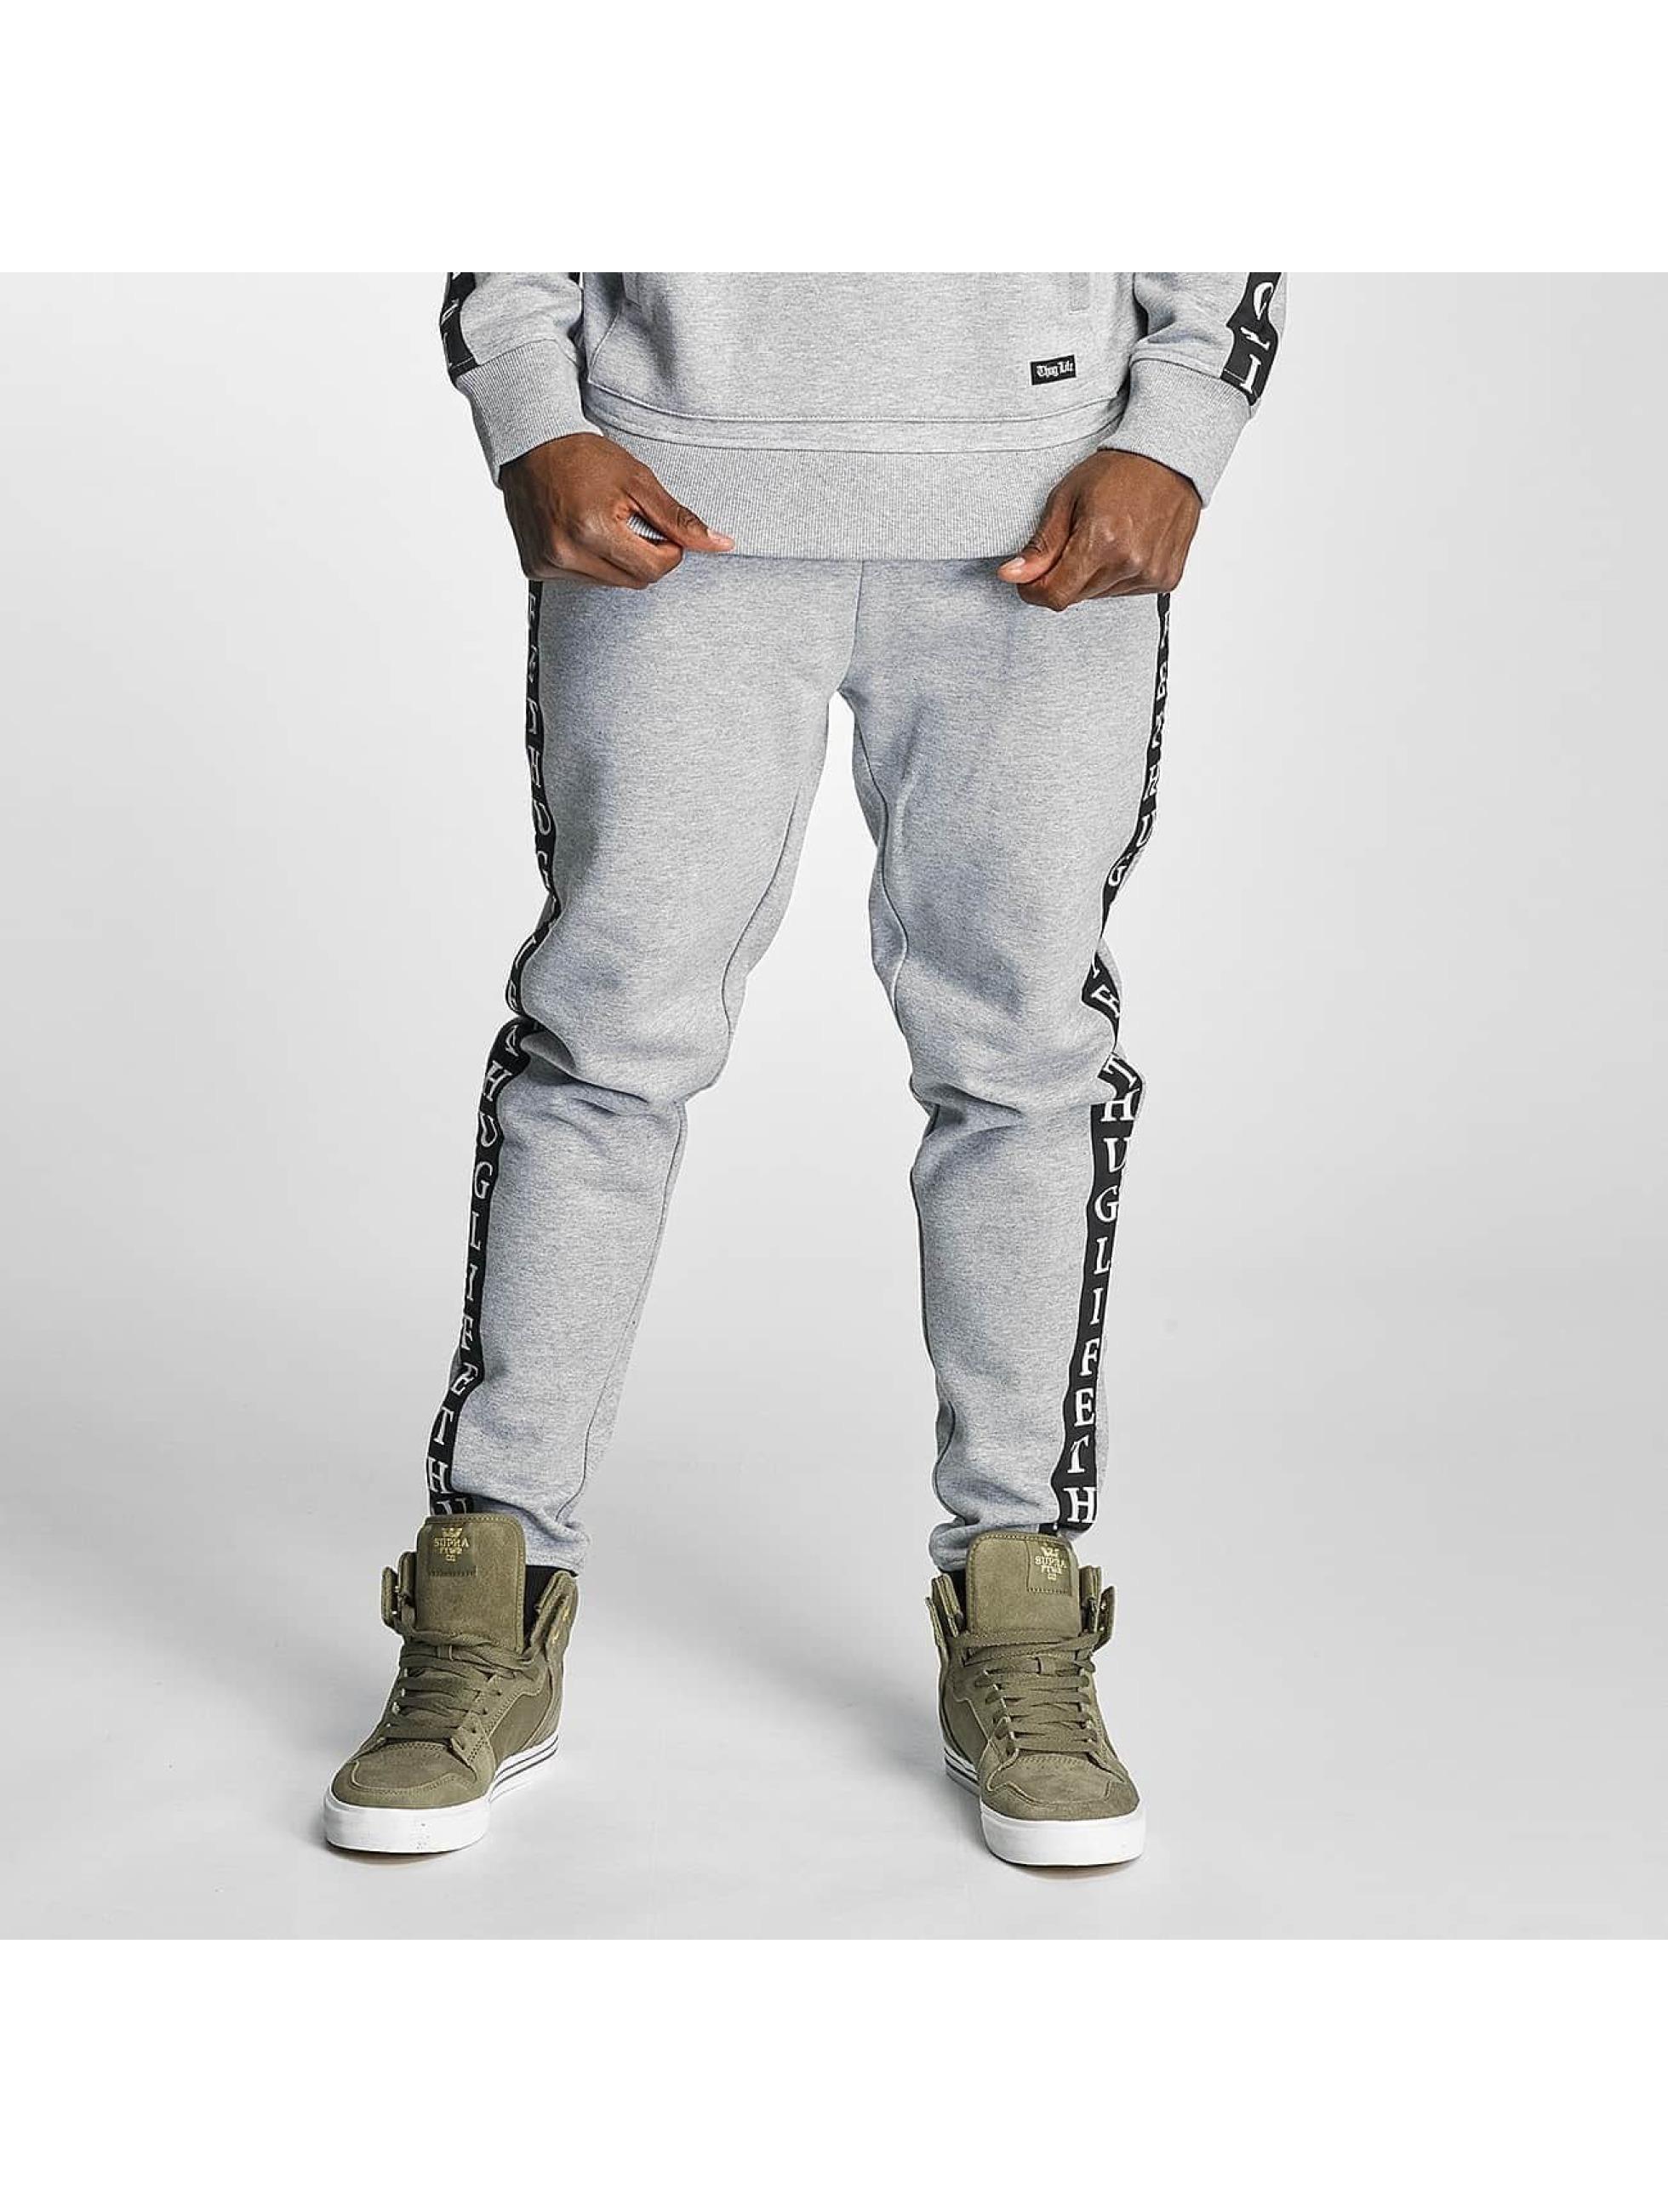 Thug Life Männer Jogginghose Wired in grau